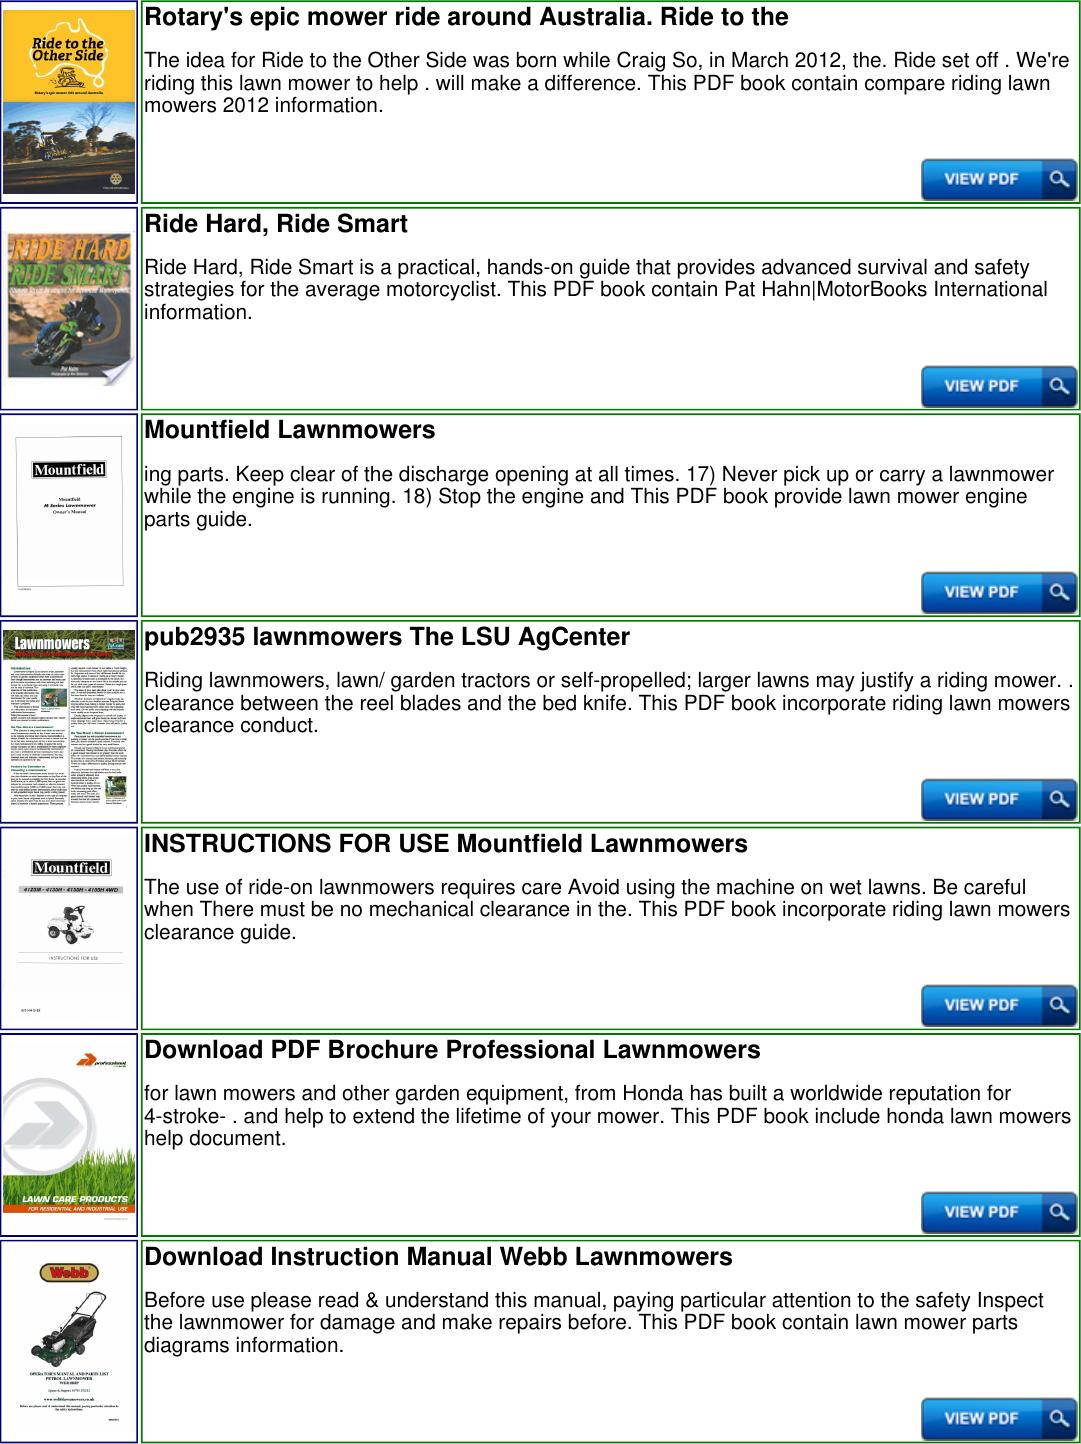 Ride On Lawnmowers American 120464 Productmanualguidecom Honda Mower Engine Parts Diagram Page 2 Of